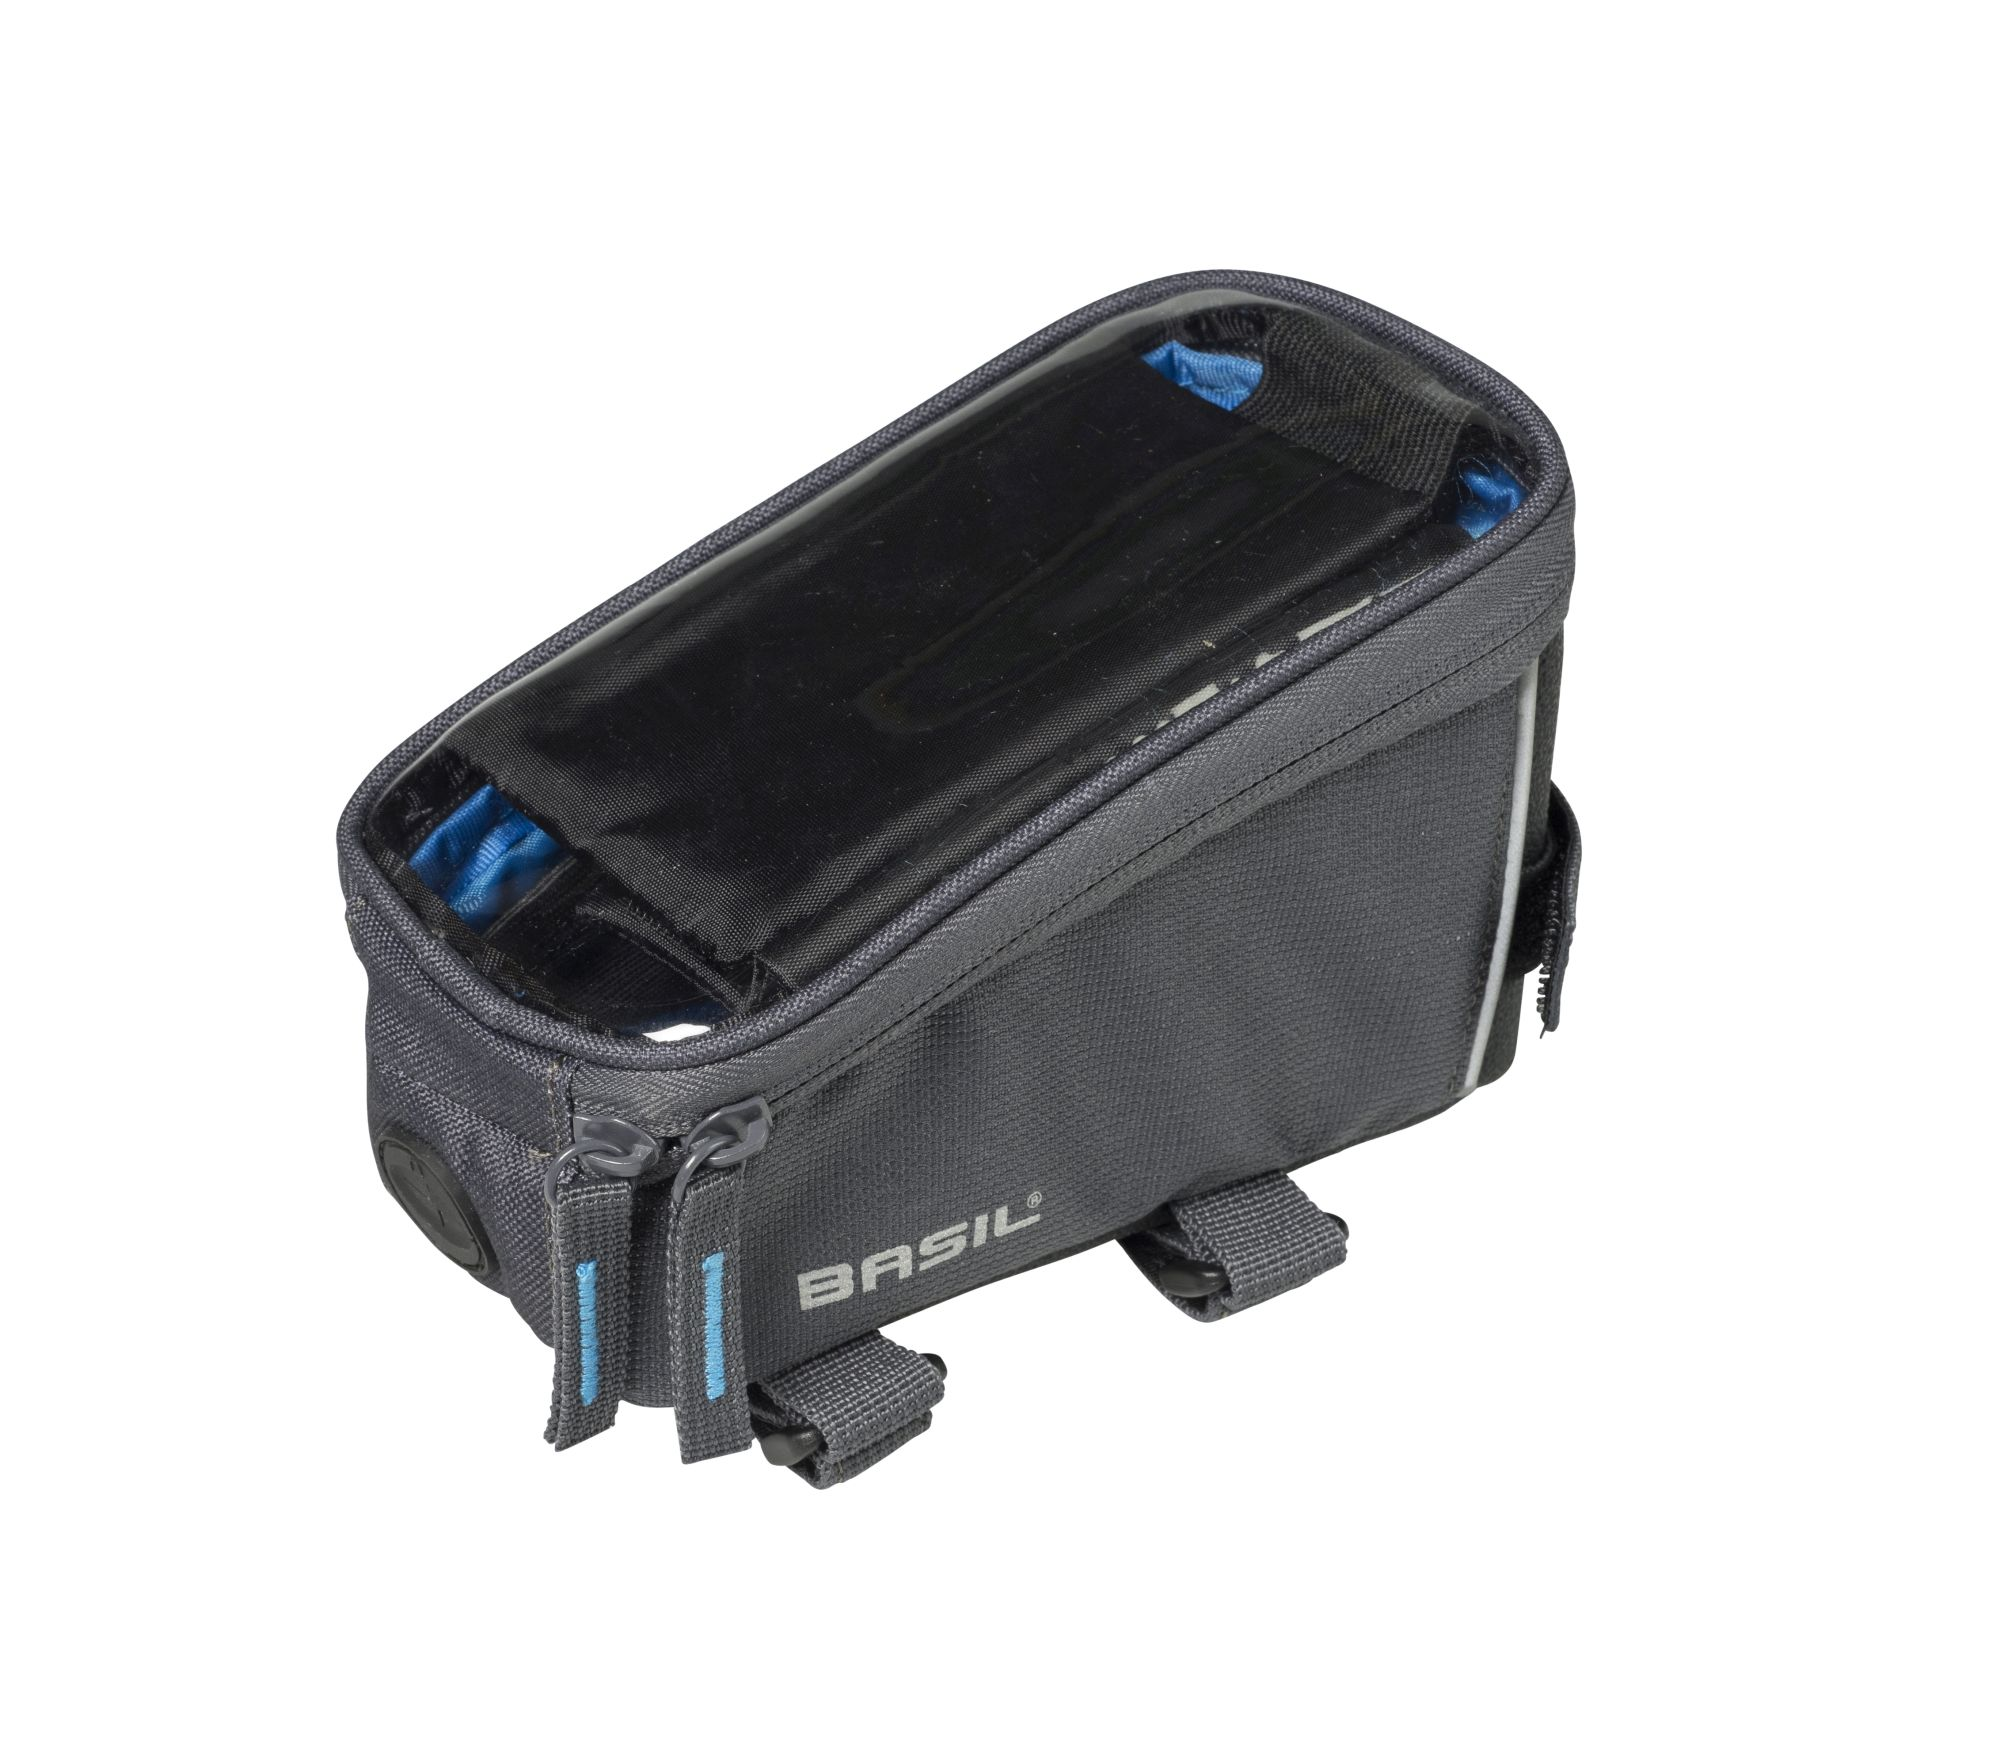 Basil Rahmentasche 1 Liter Sport Design Frame Bag